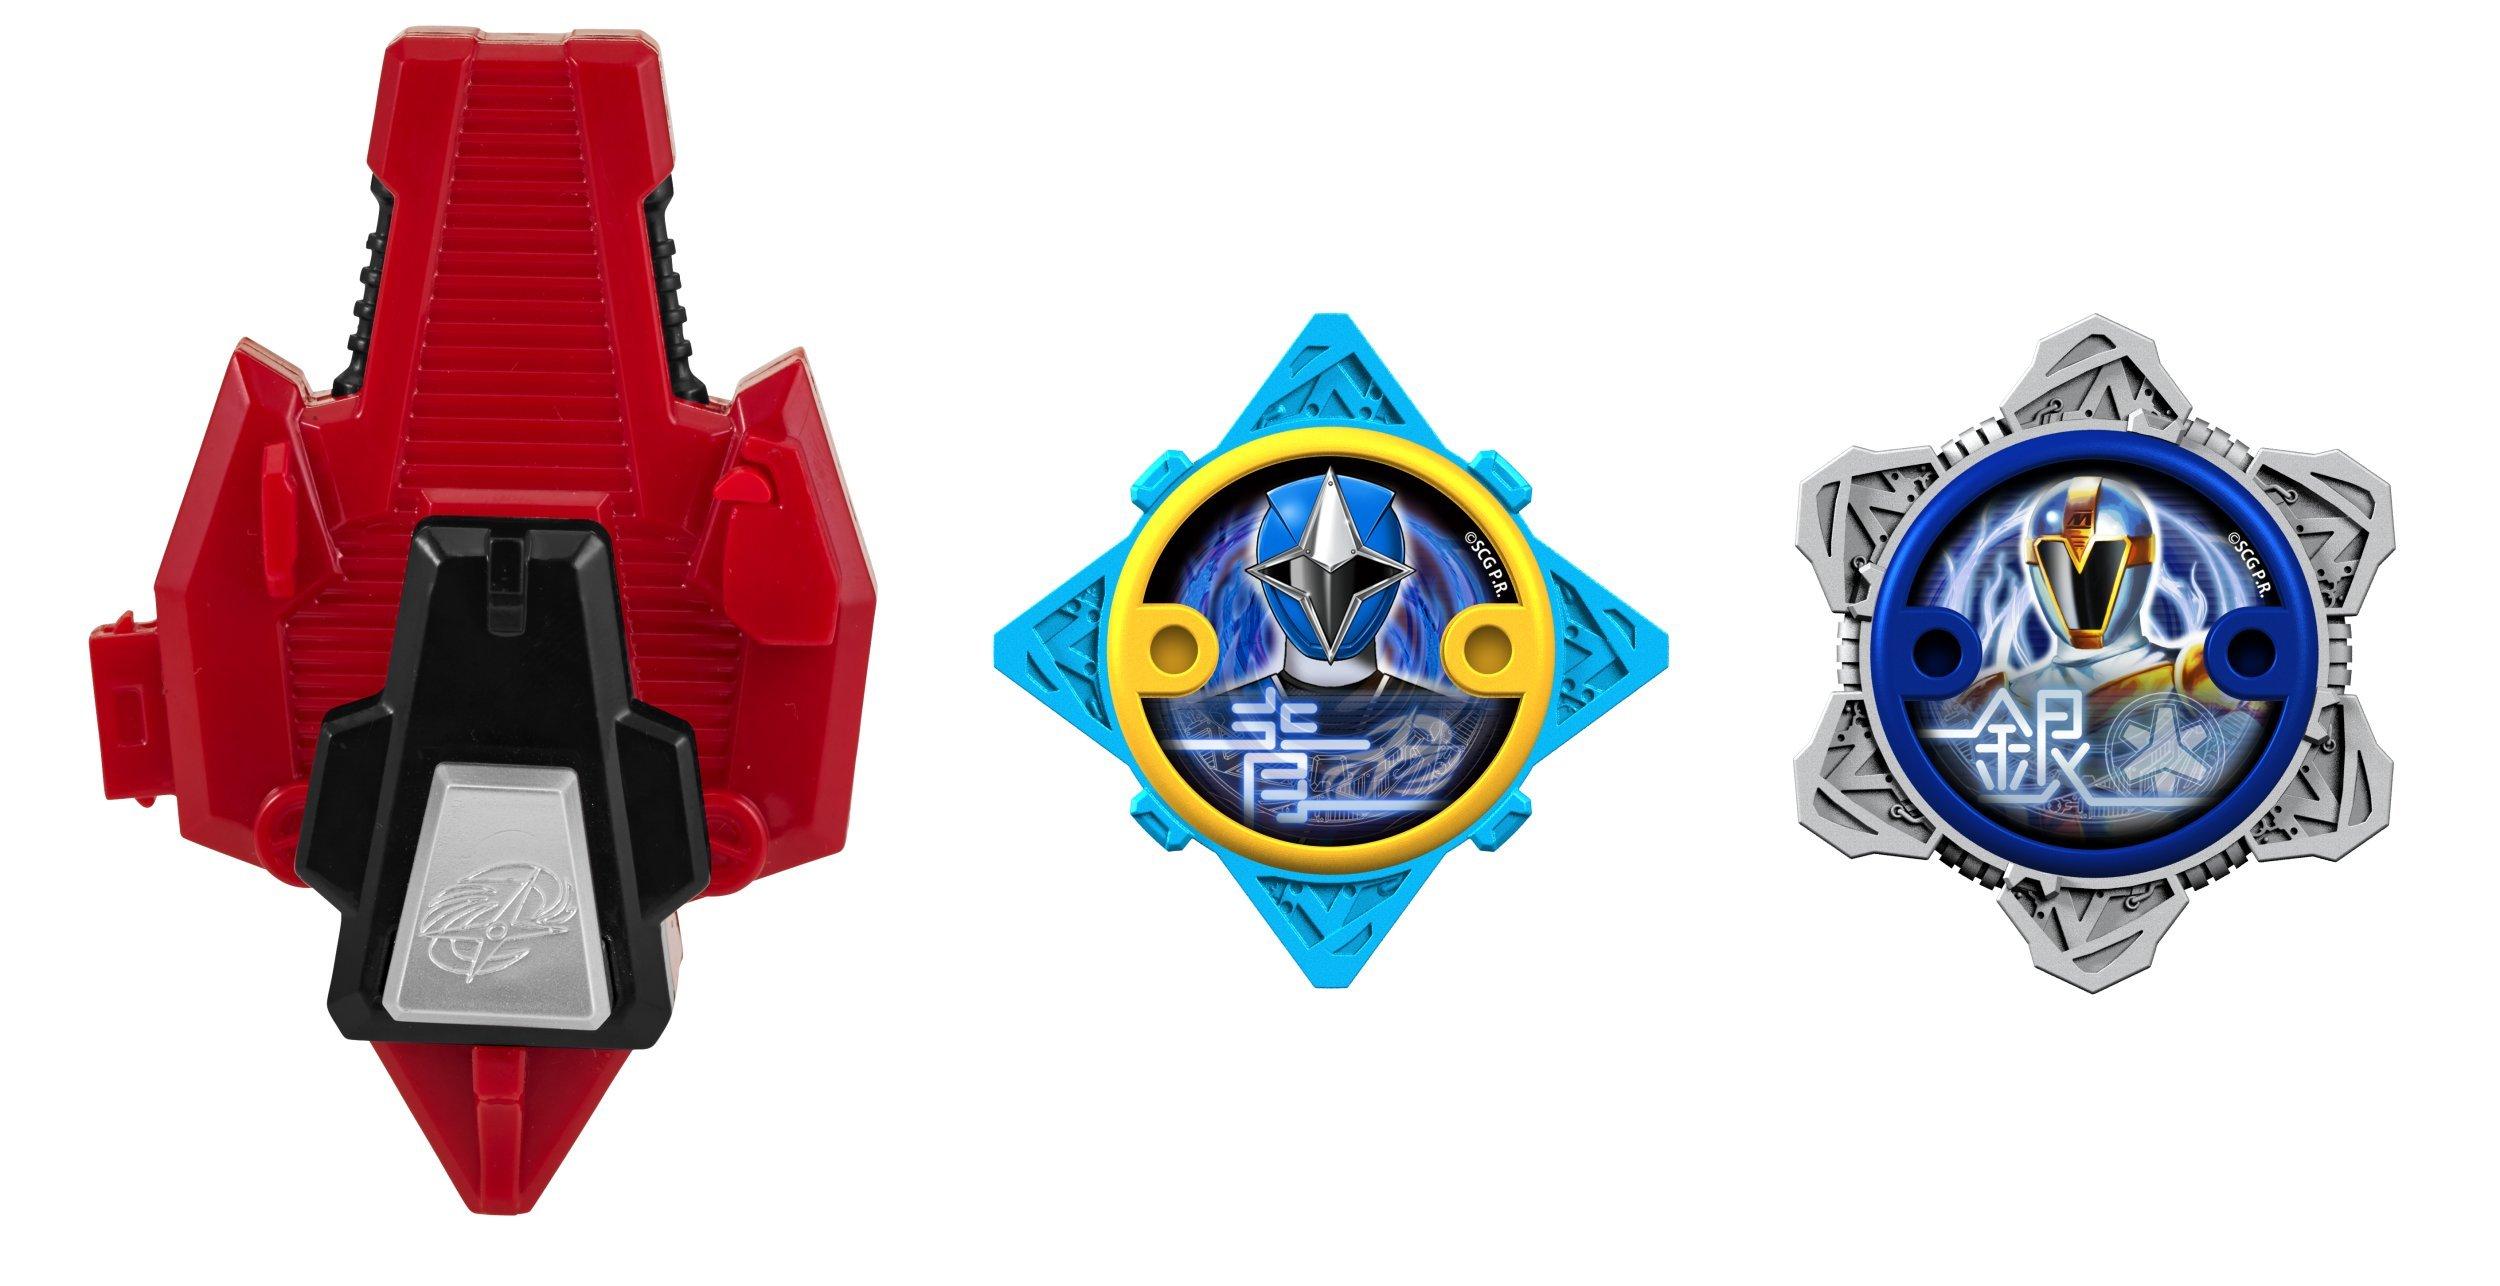 Power Rangers Super Steel Ninja Power Star Pack, Dragon Zord